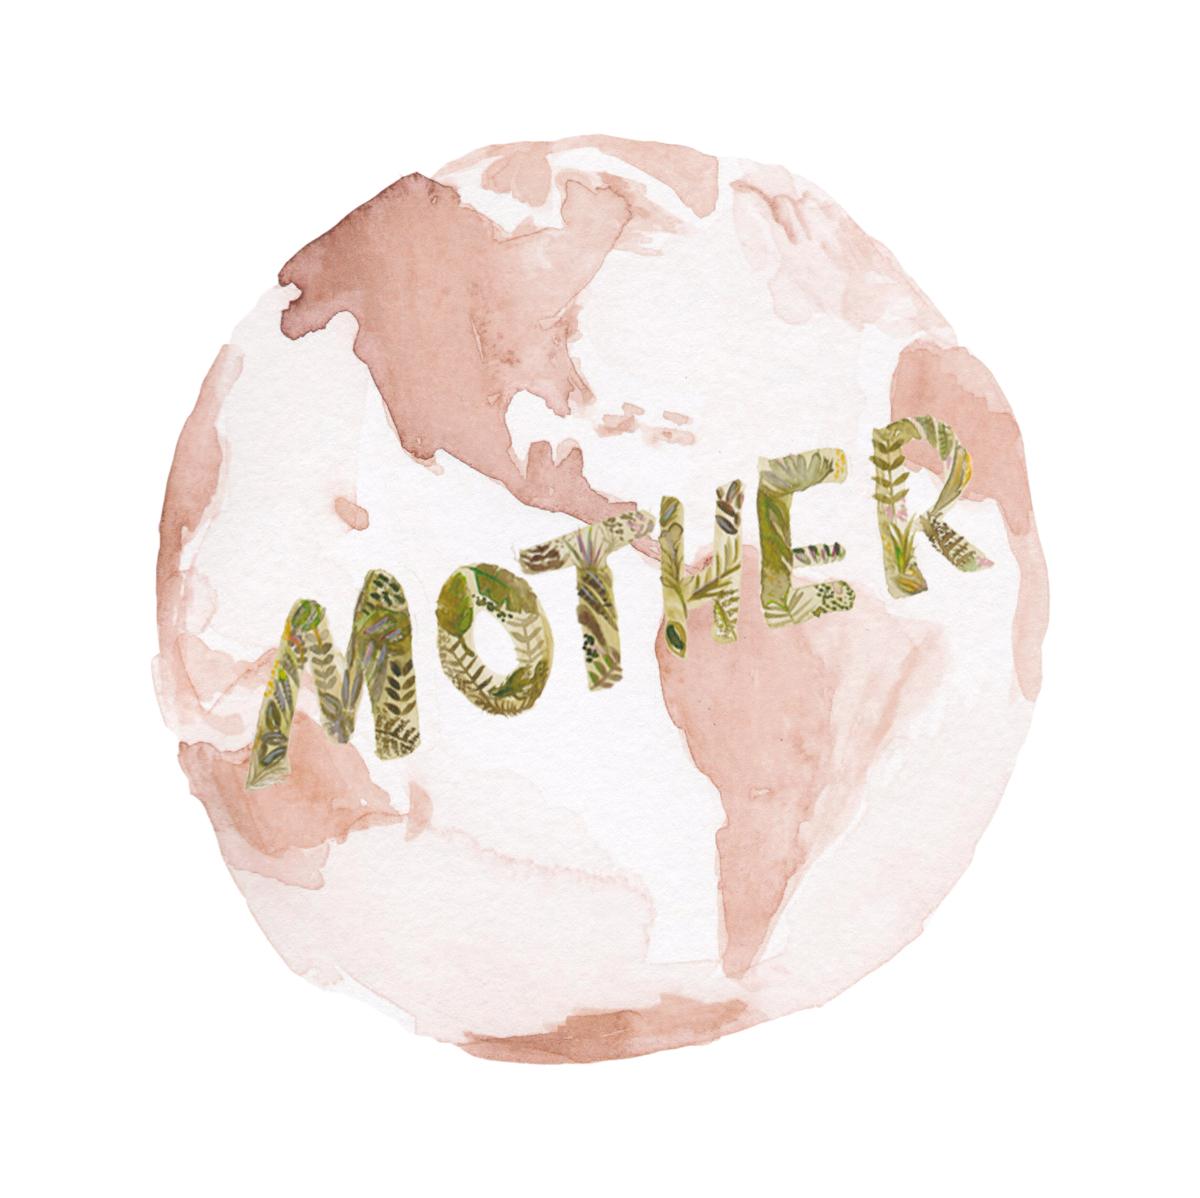 Joya Logue_Still We Rise_Mother Blush.JPG